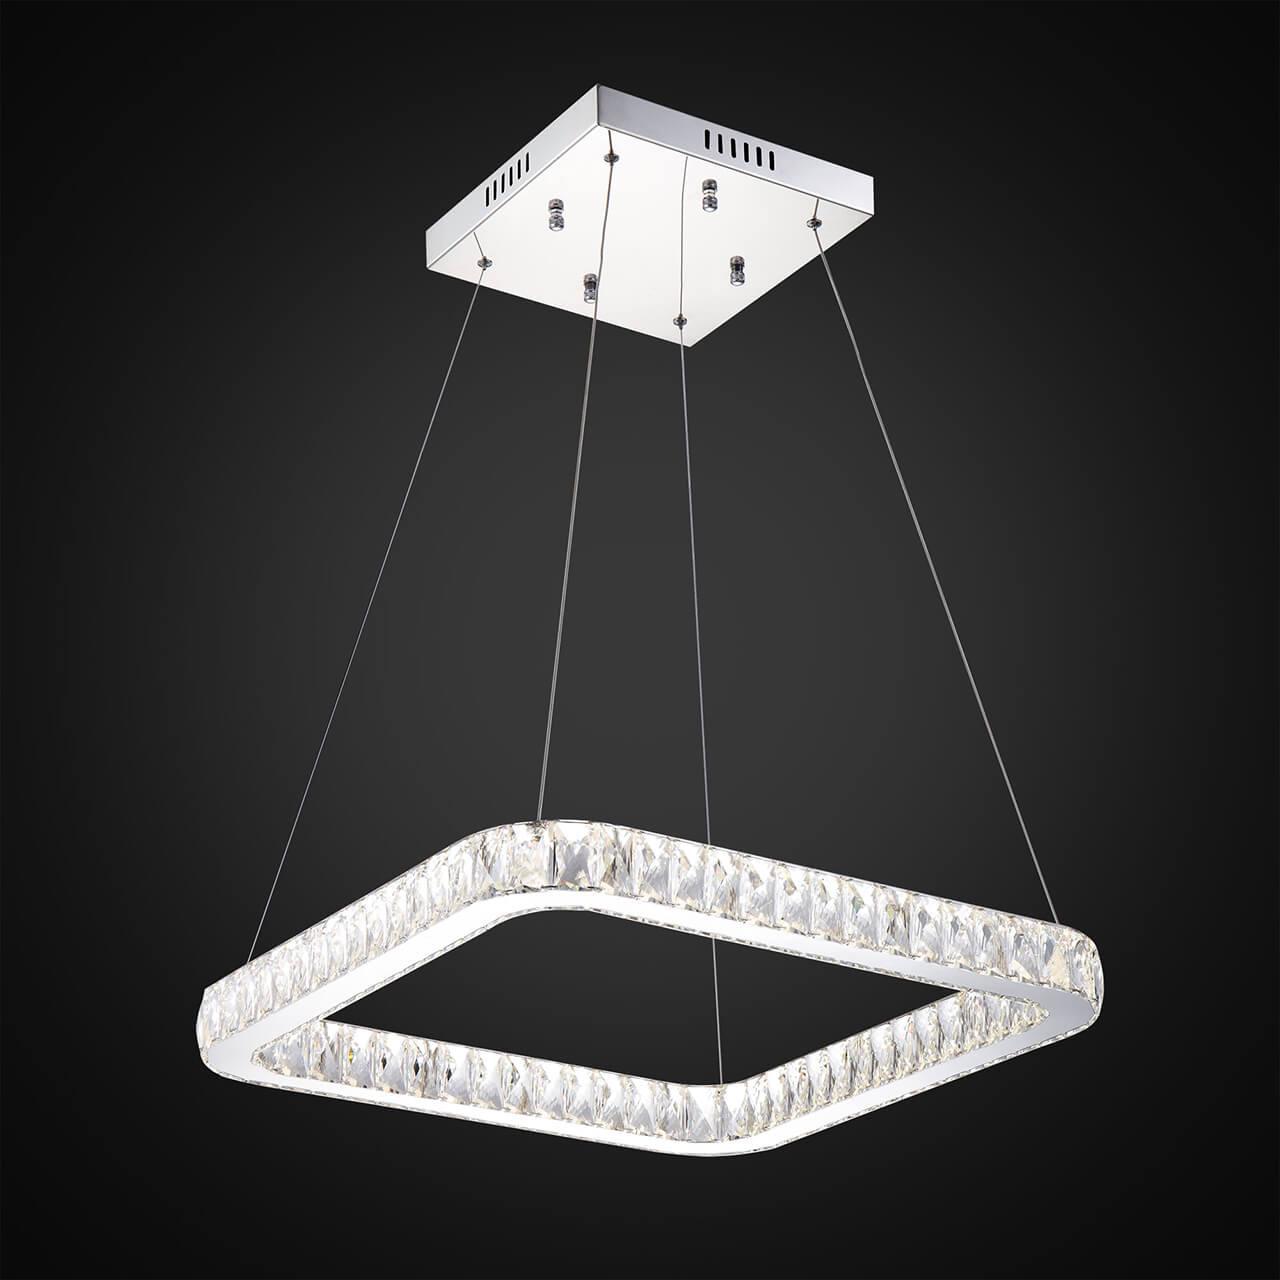 Подвесной светодиодный светильник Citilux Eletto Granda EL336P40 eletto el351p08 1